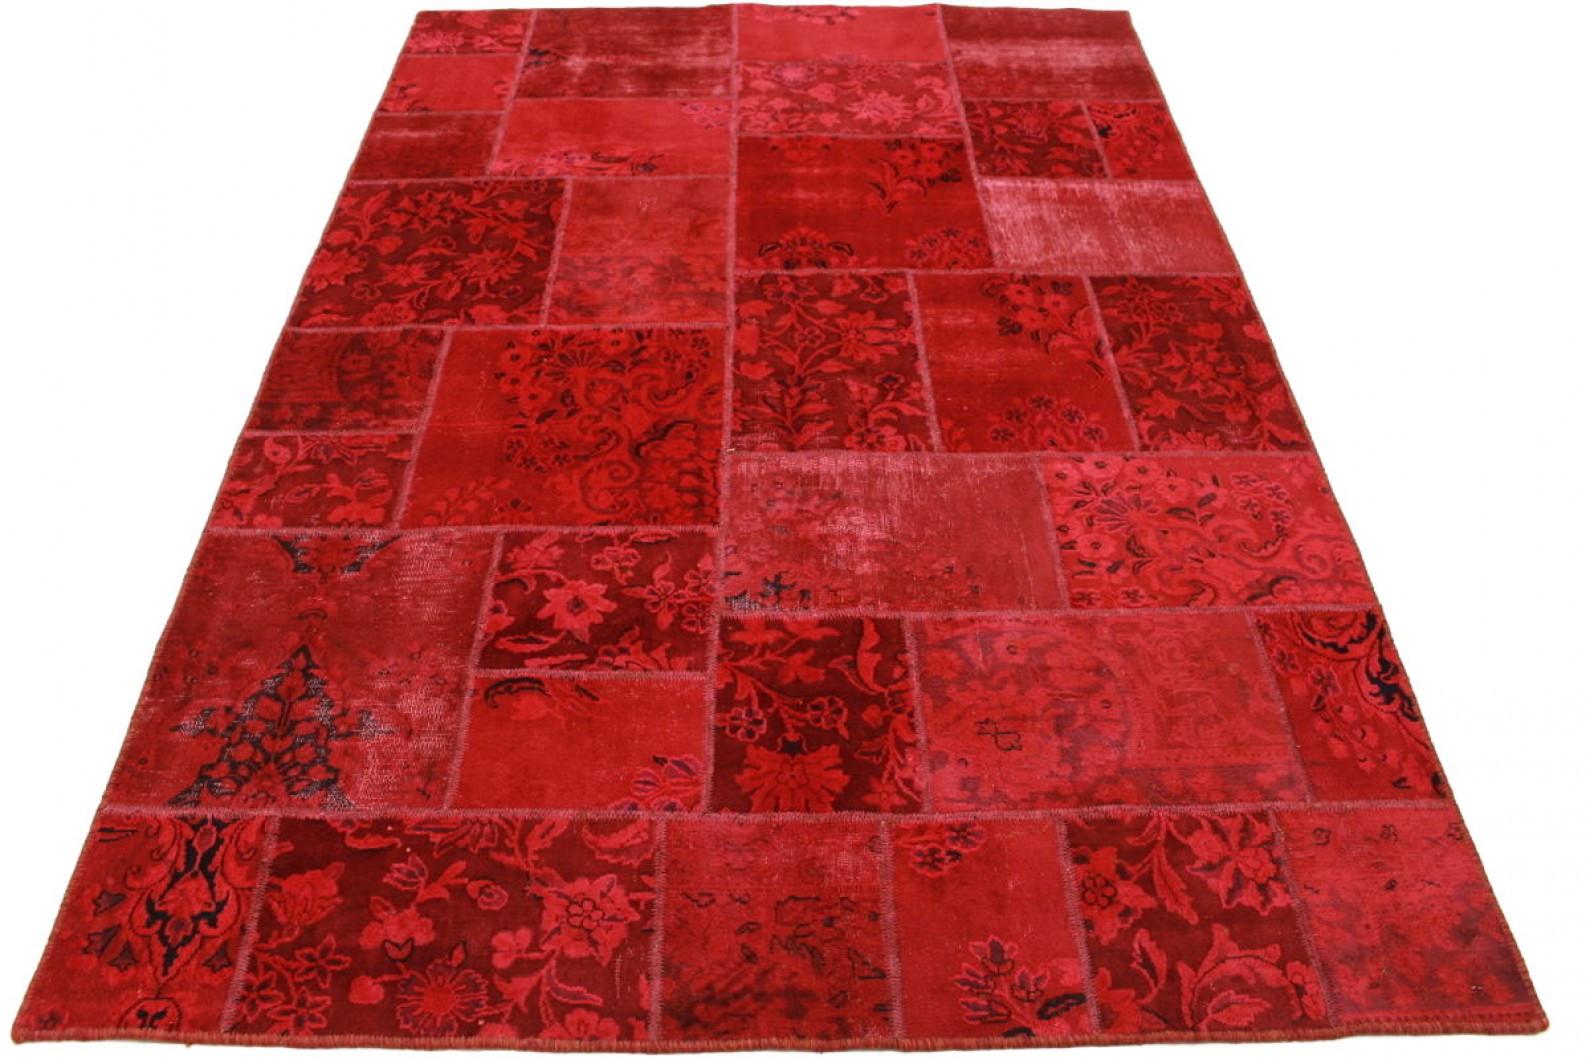 Teppich Rot  Vintage Teppich Rot in 240x160cm 1001 2145 bei carpetido